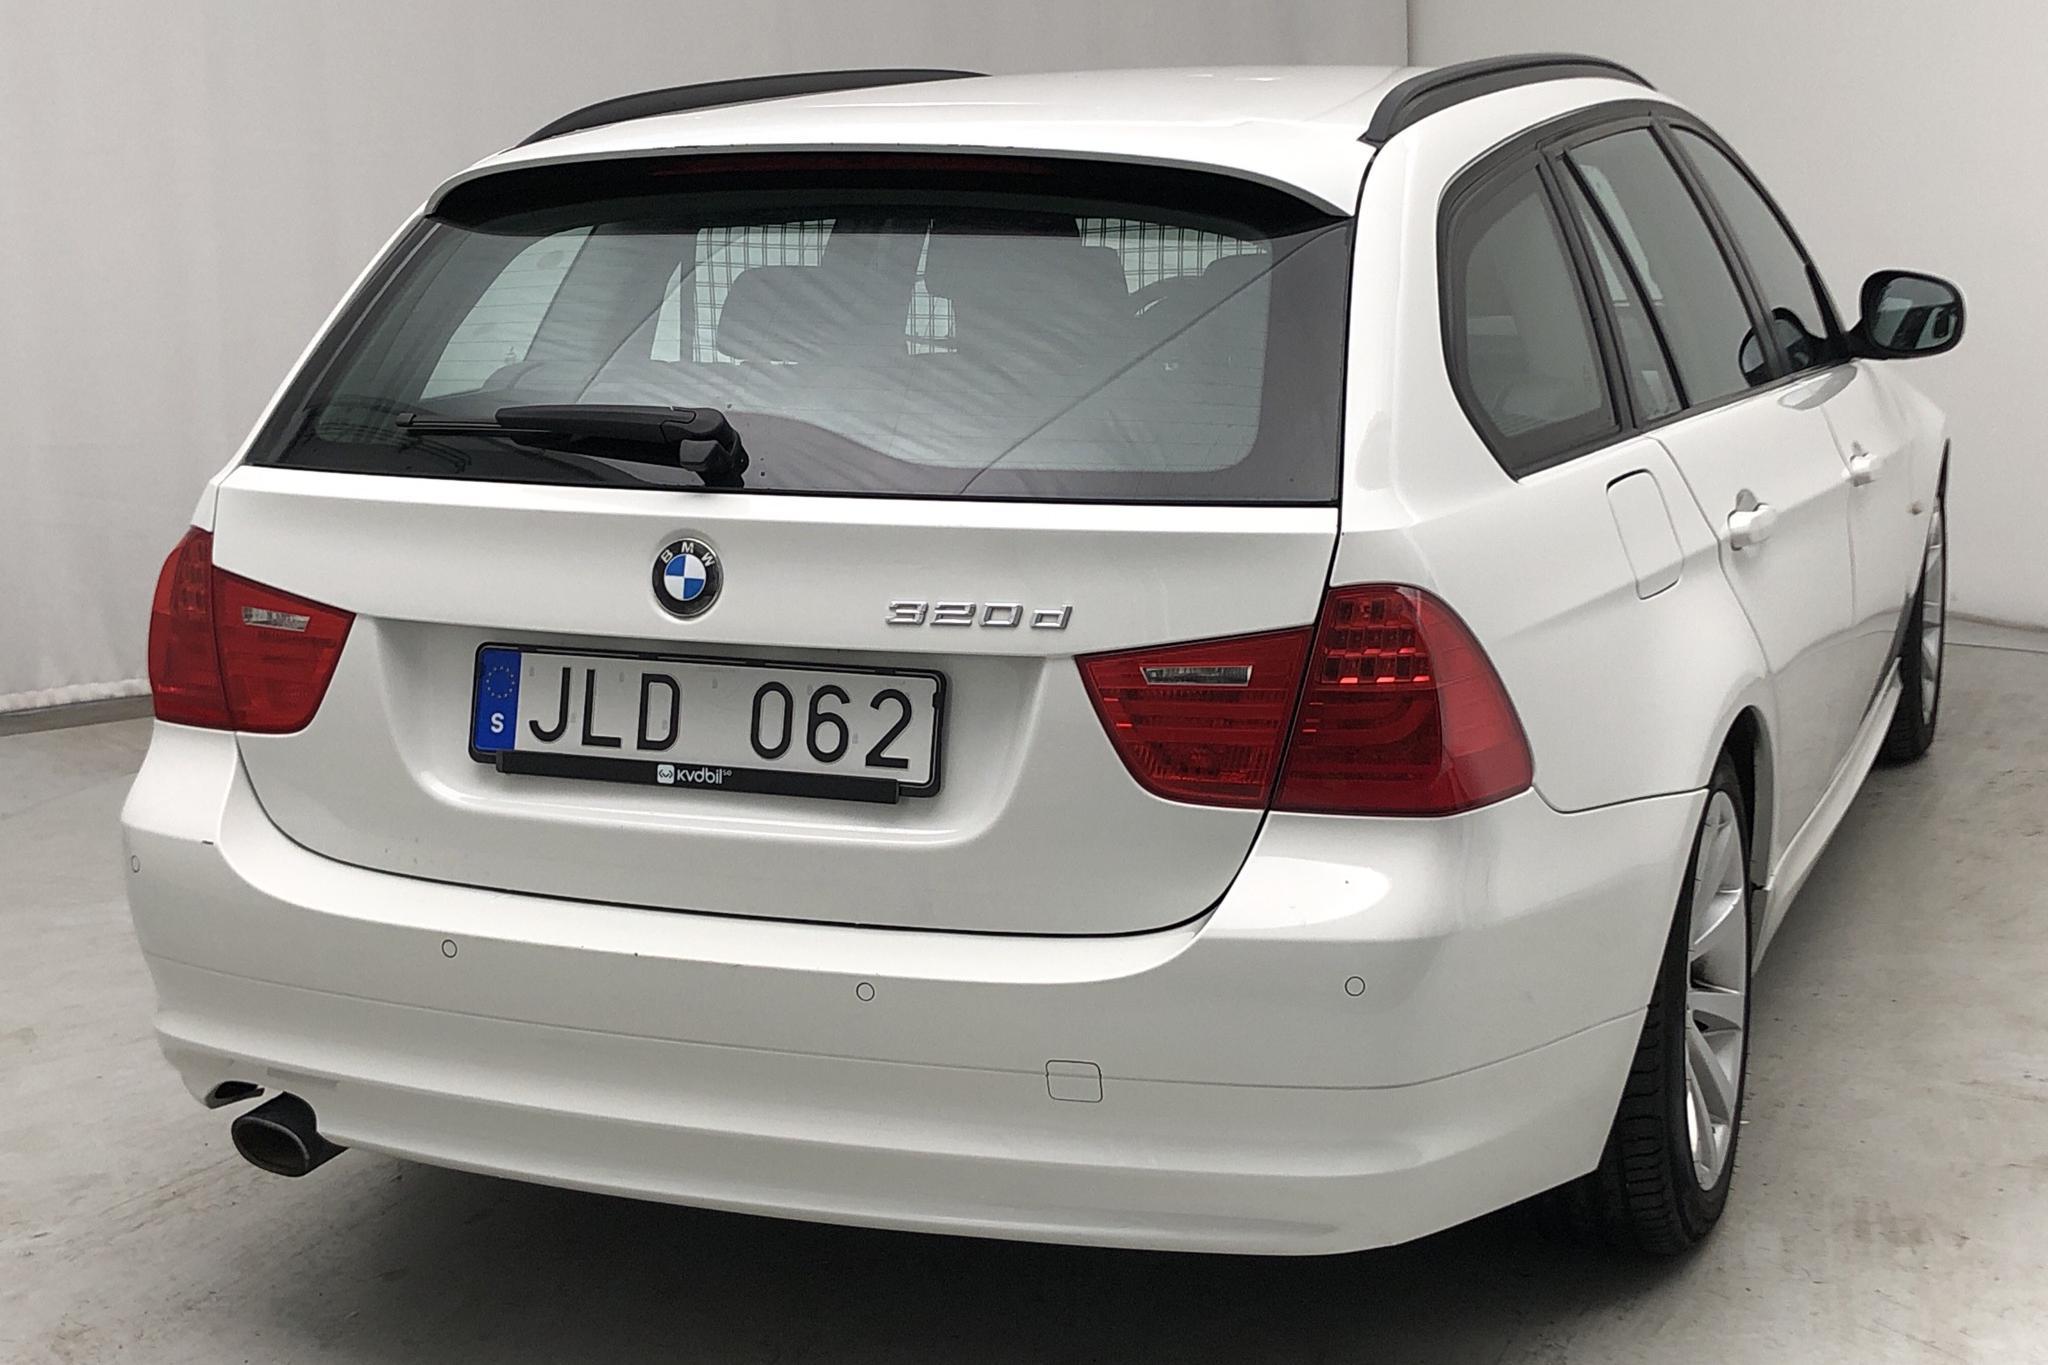 BMW 320d Touring, E91 (184hk) - 275 000 km - Automatic - white - 2011